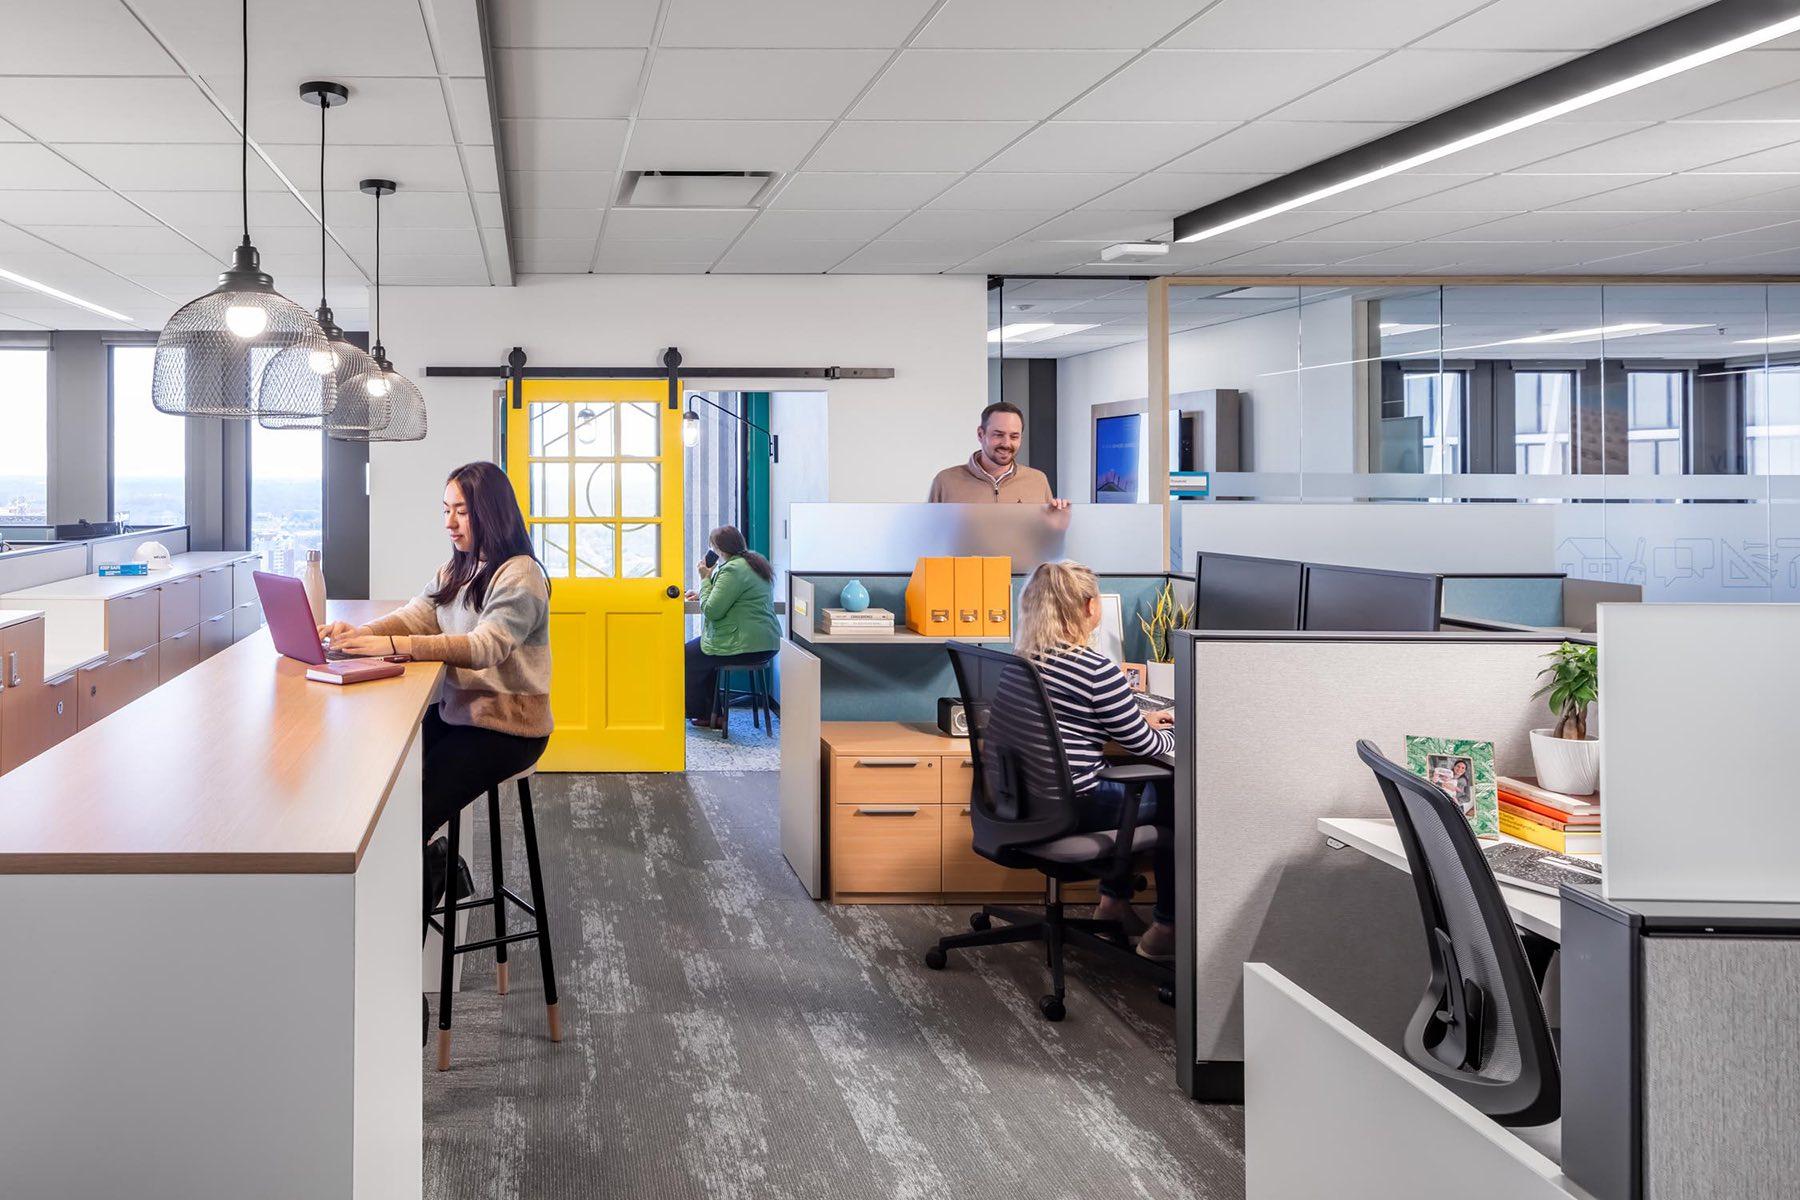 A Tour Of Habitat For Humanity's Atlanta Headquarters